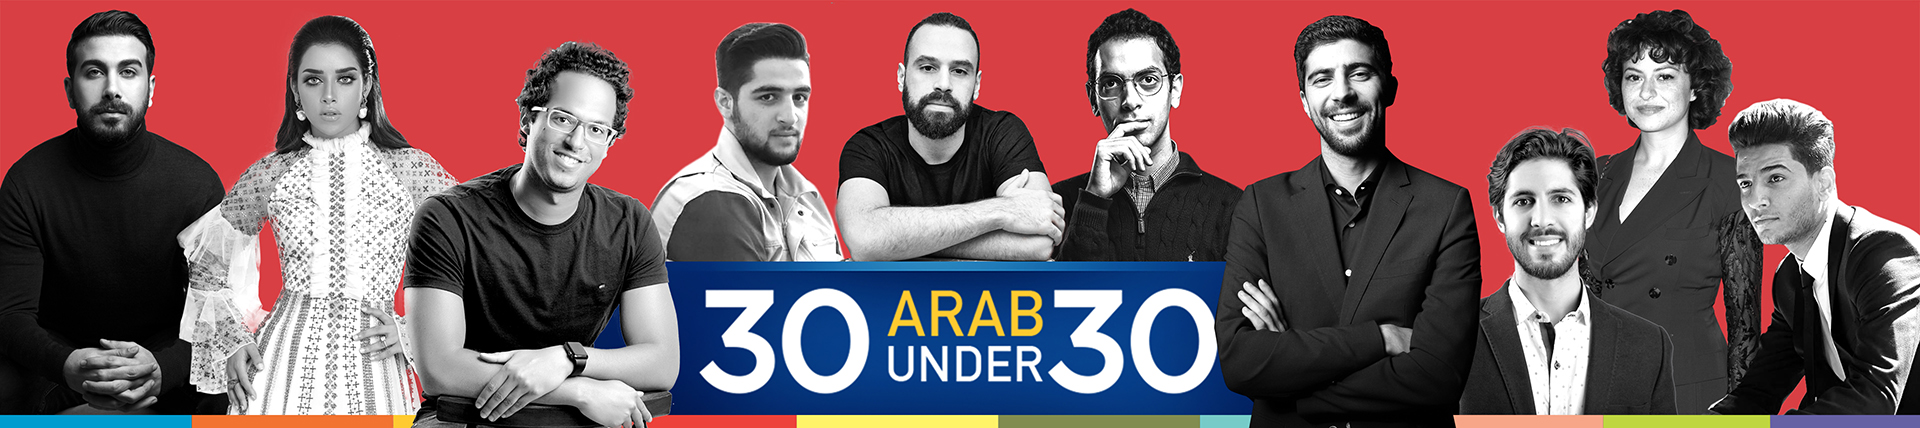 Arab 30 Under 30 - 2018